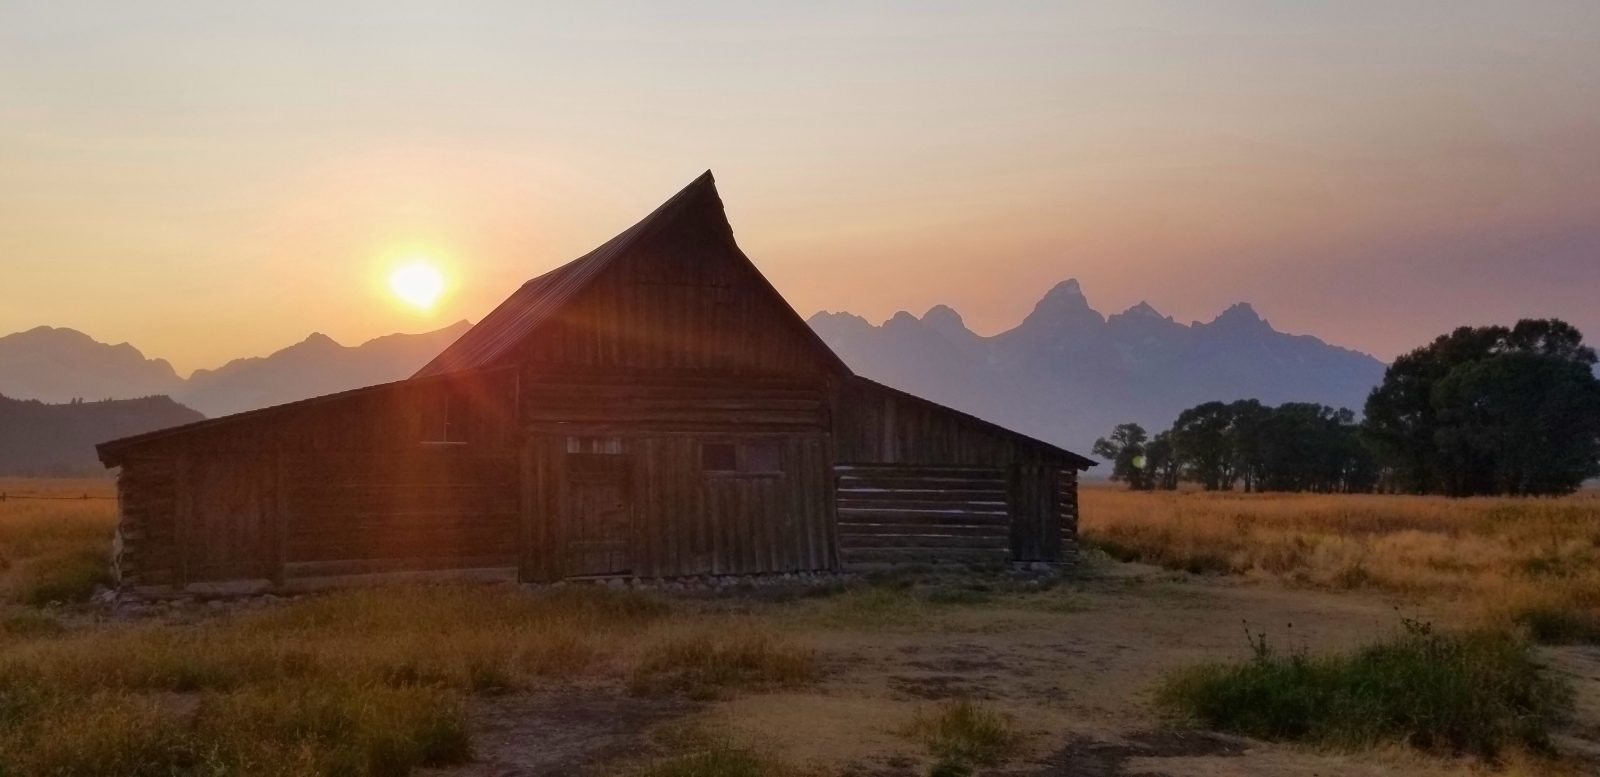 Grand Tetons National Park Mormon Cabin